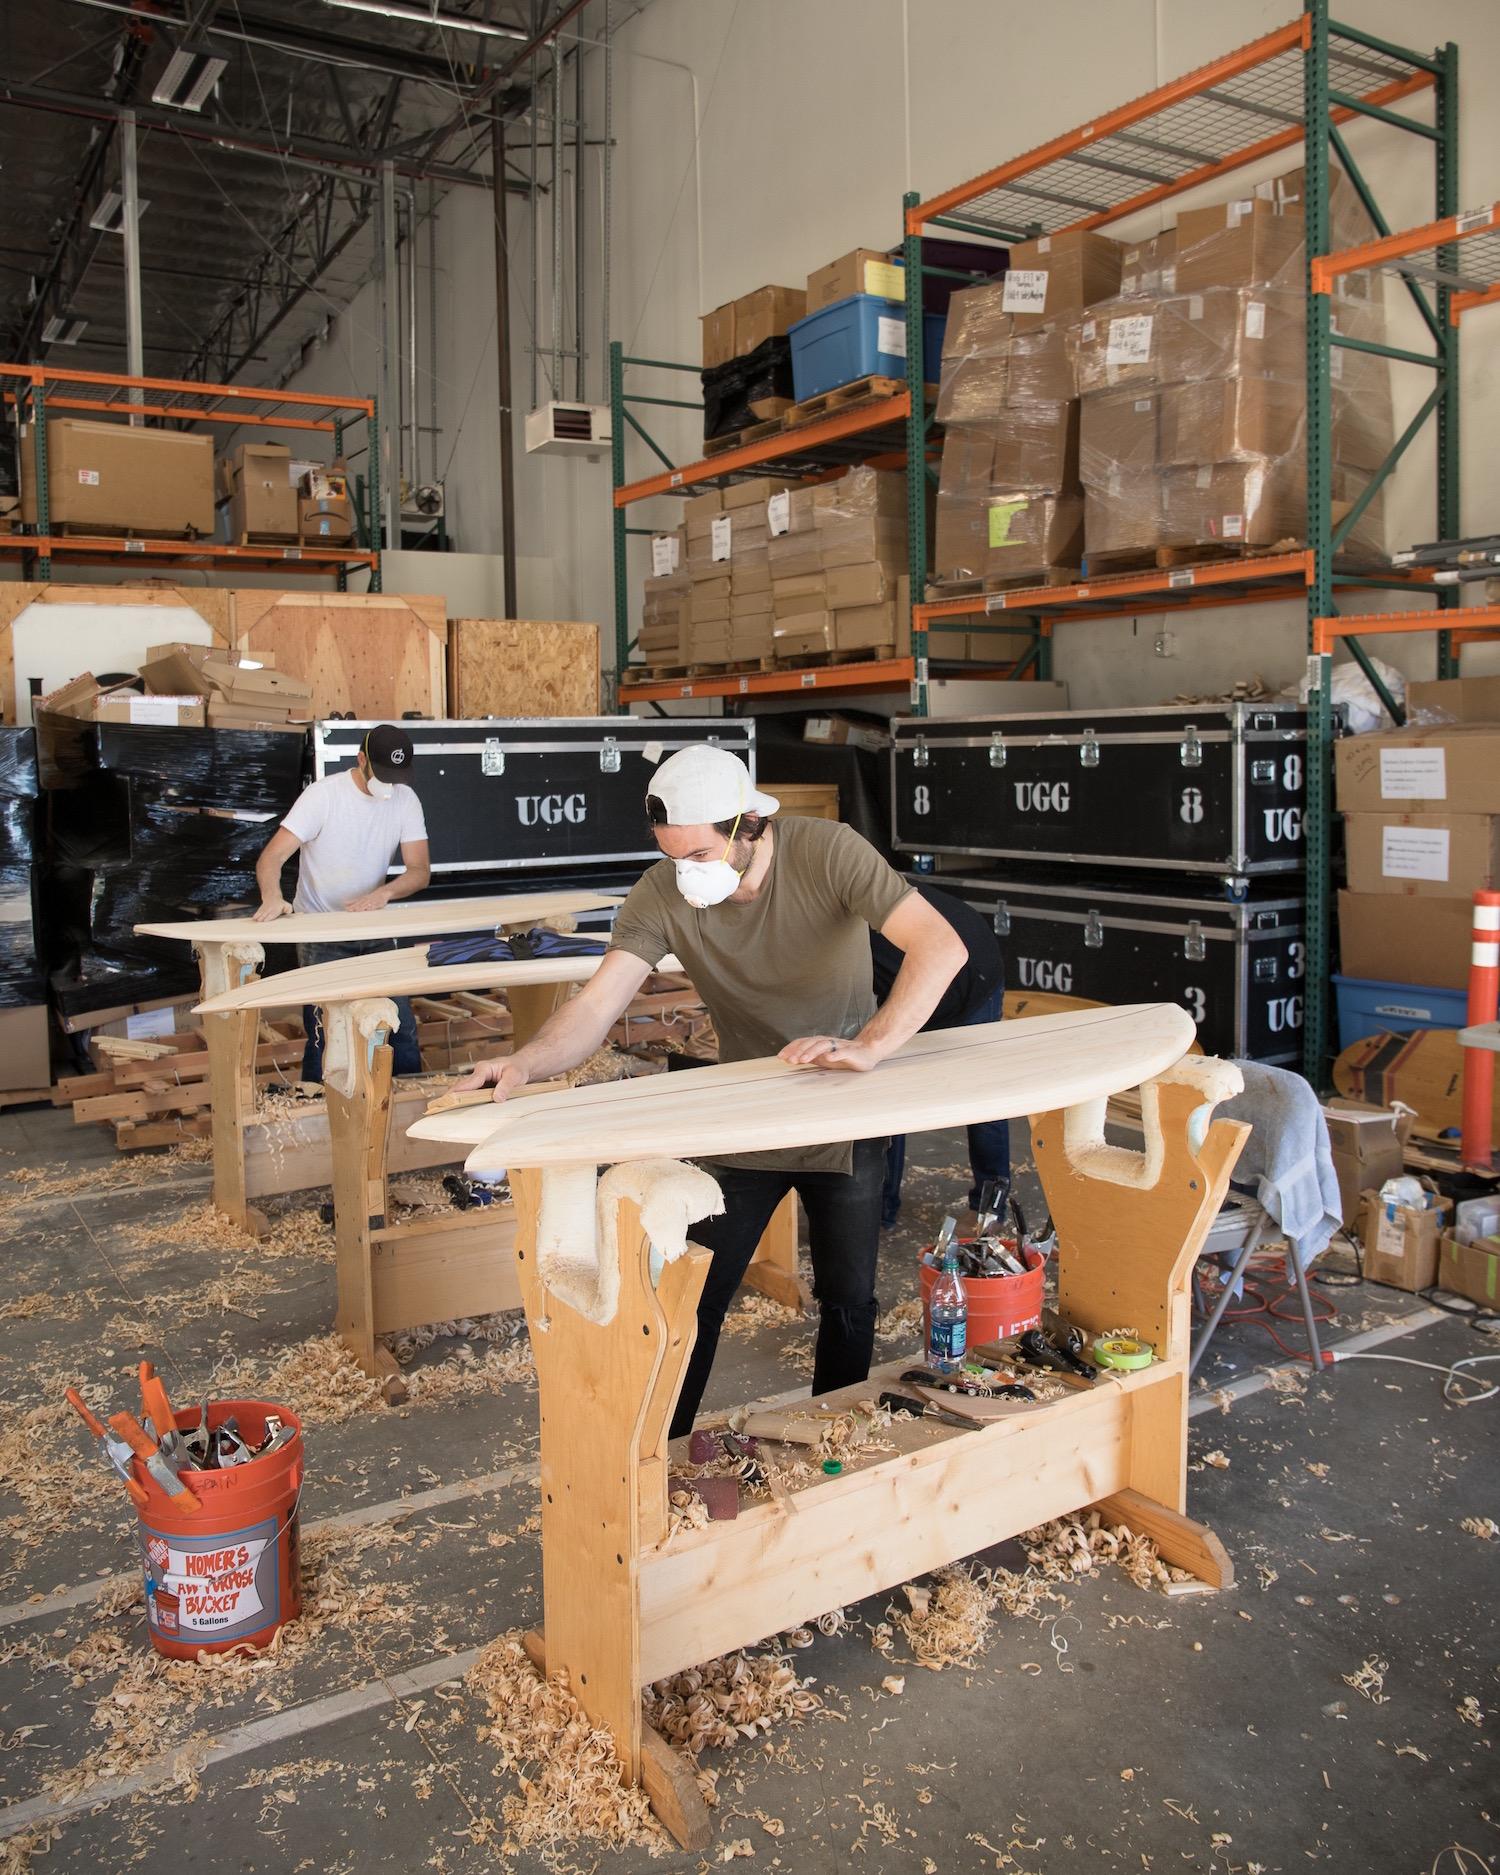 Steve Dubbeldam sands his board in the Grain workshop.